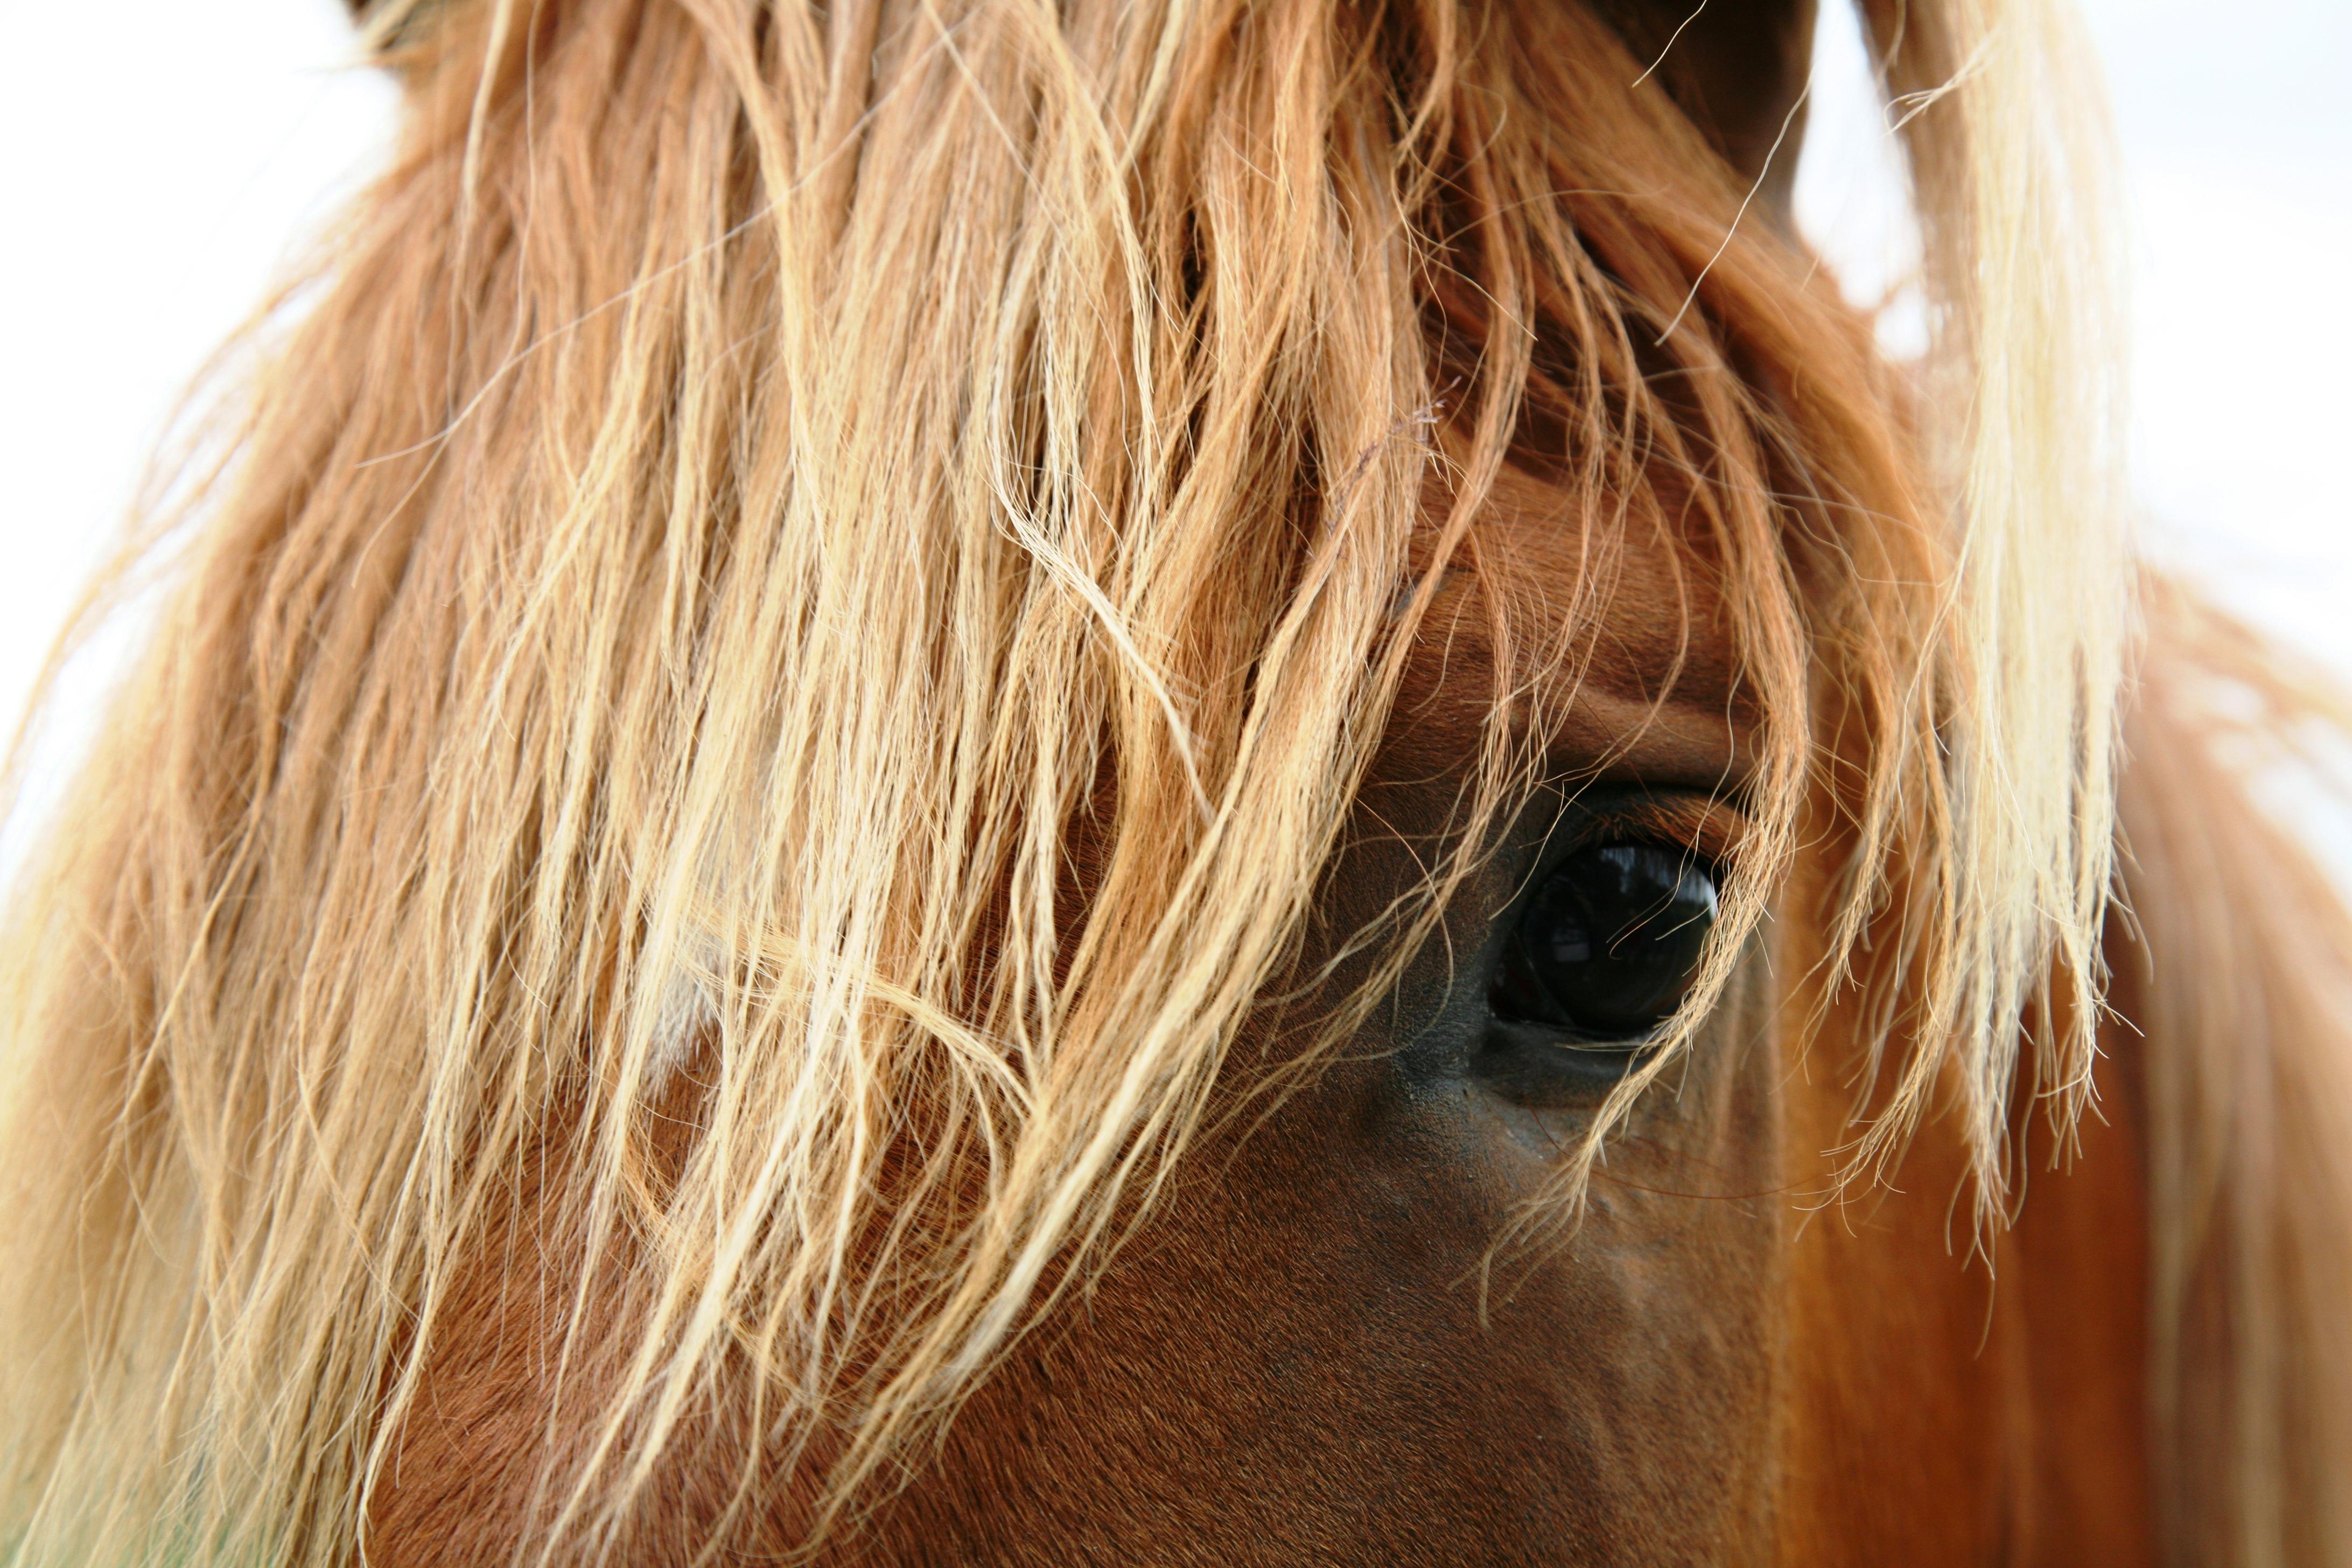 Horses saddled with gender bias: mares seen as 'bossy' - Horseyard.com.au